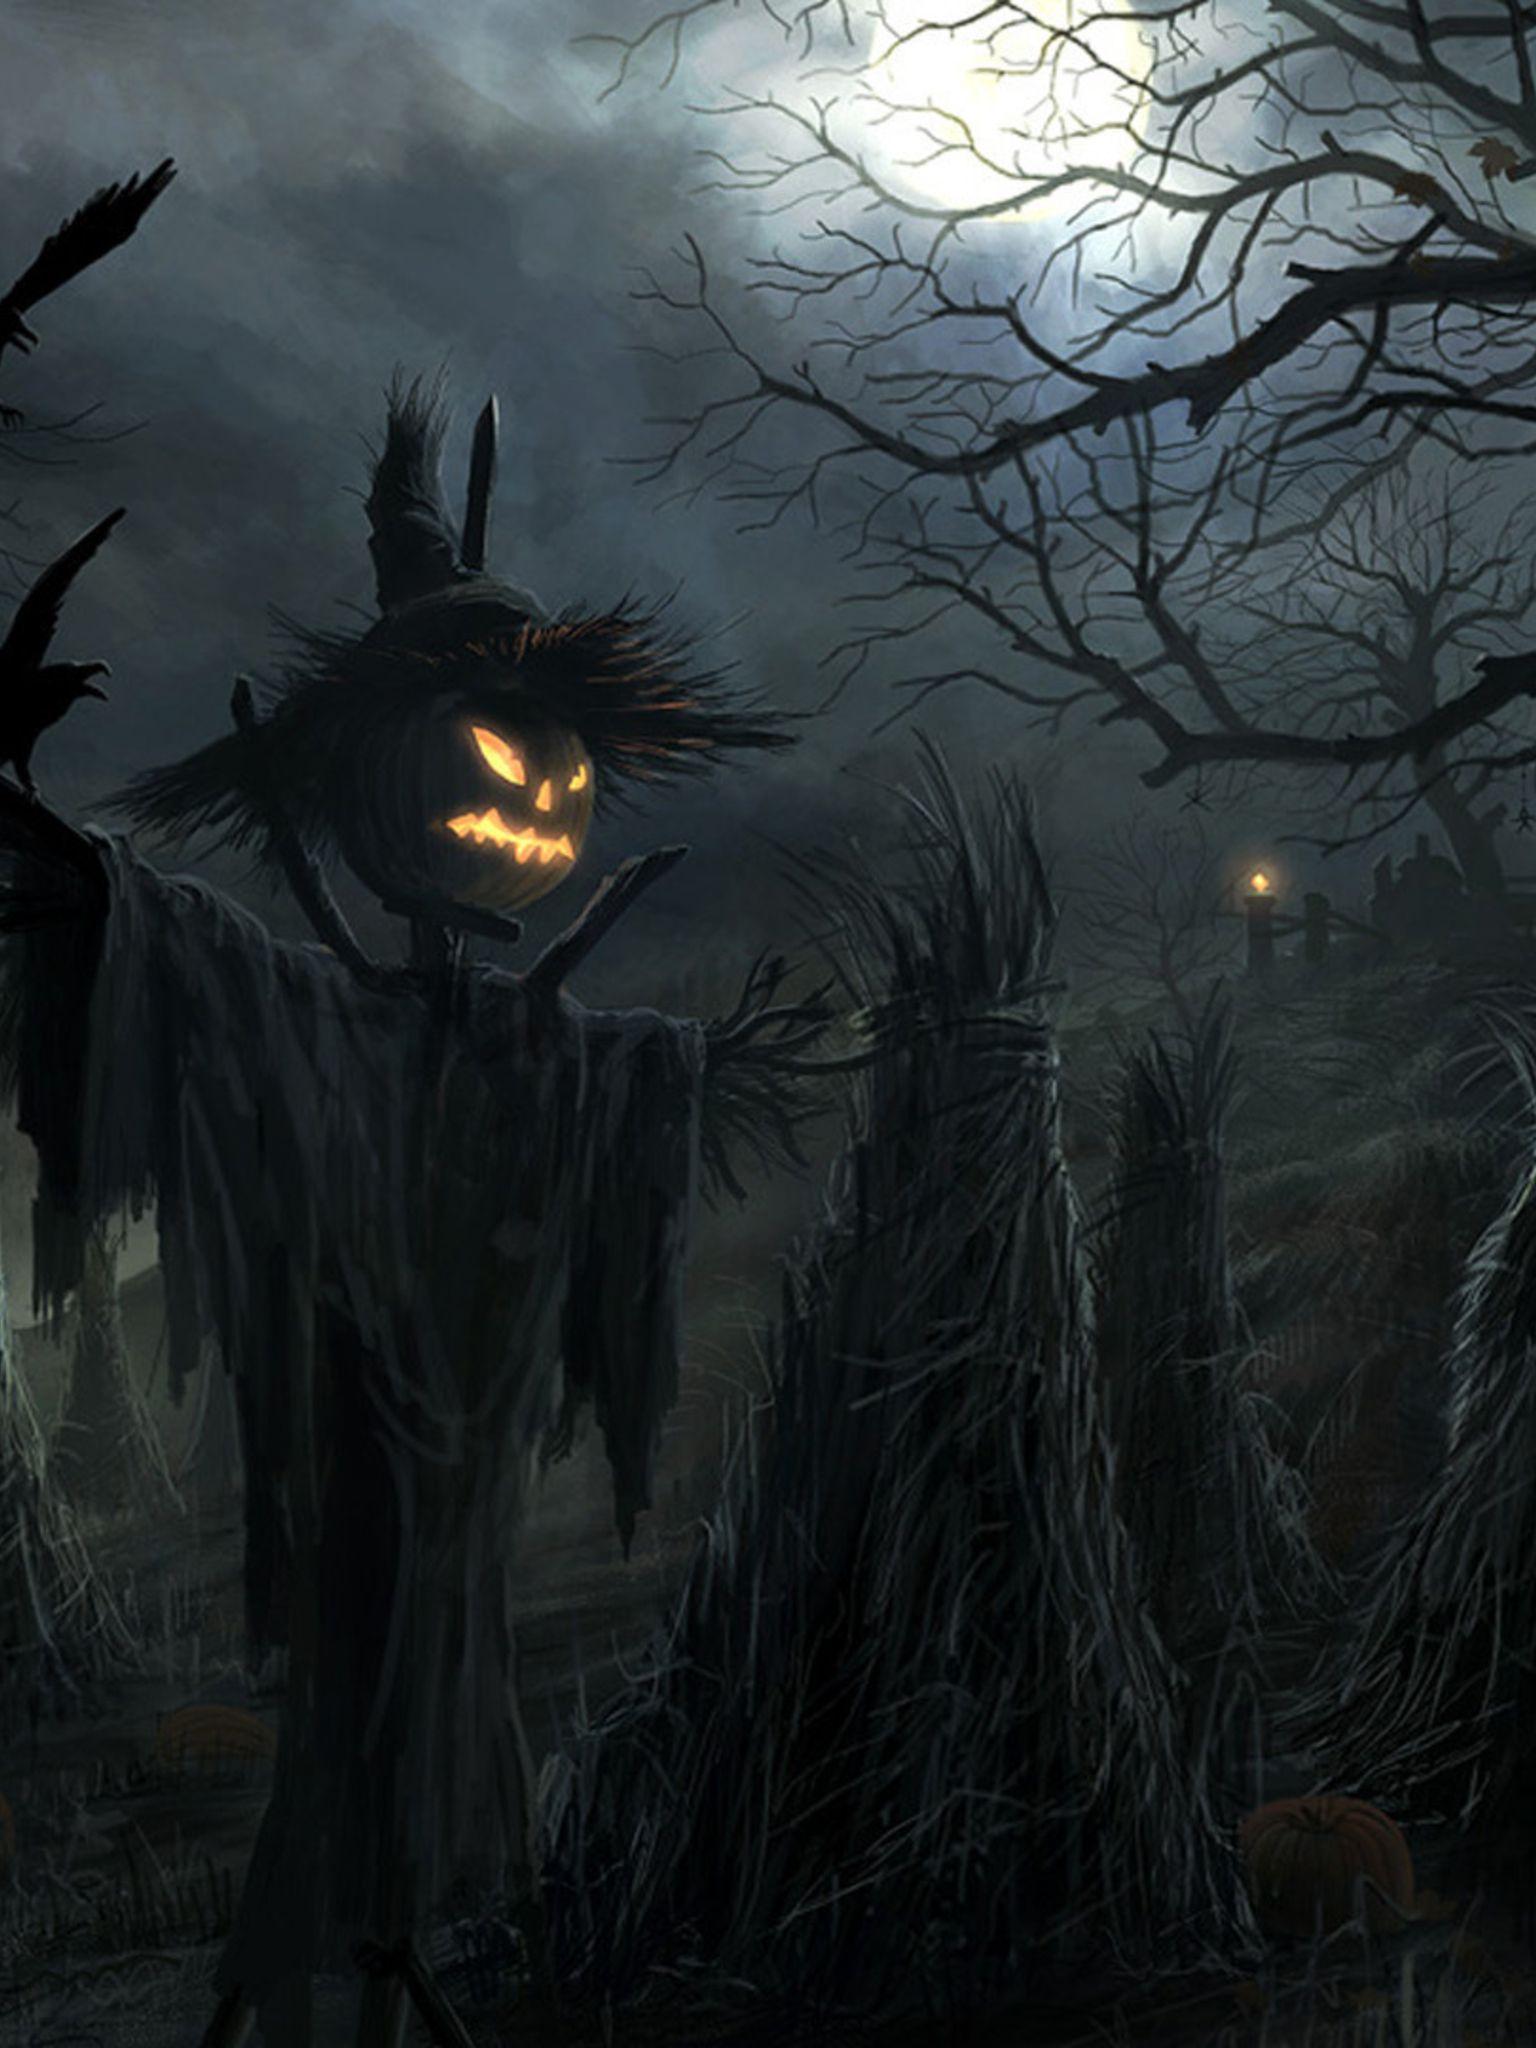 Scary Halloween wallpaper 1536x2048 4k HD wallpaper wallpprscom 1536x2048